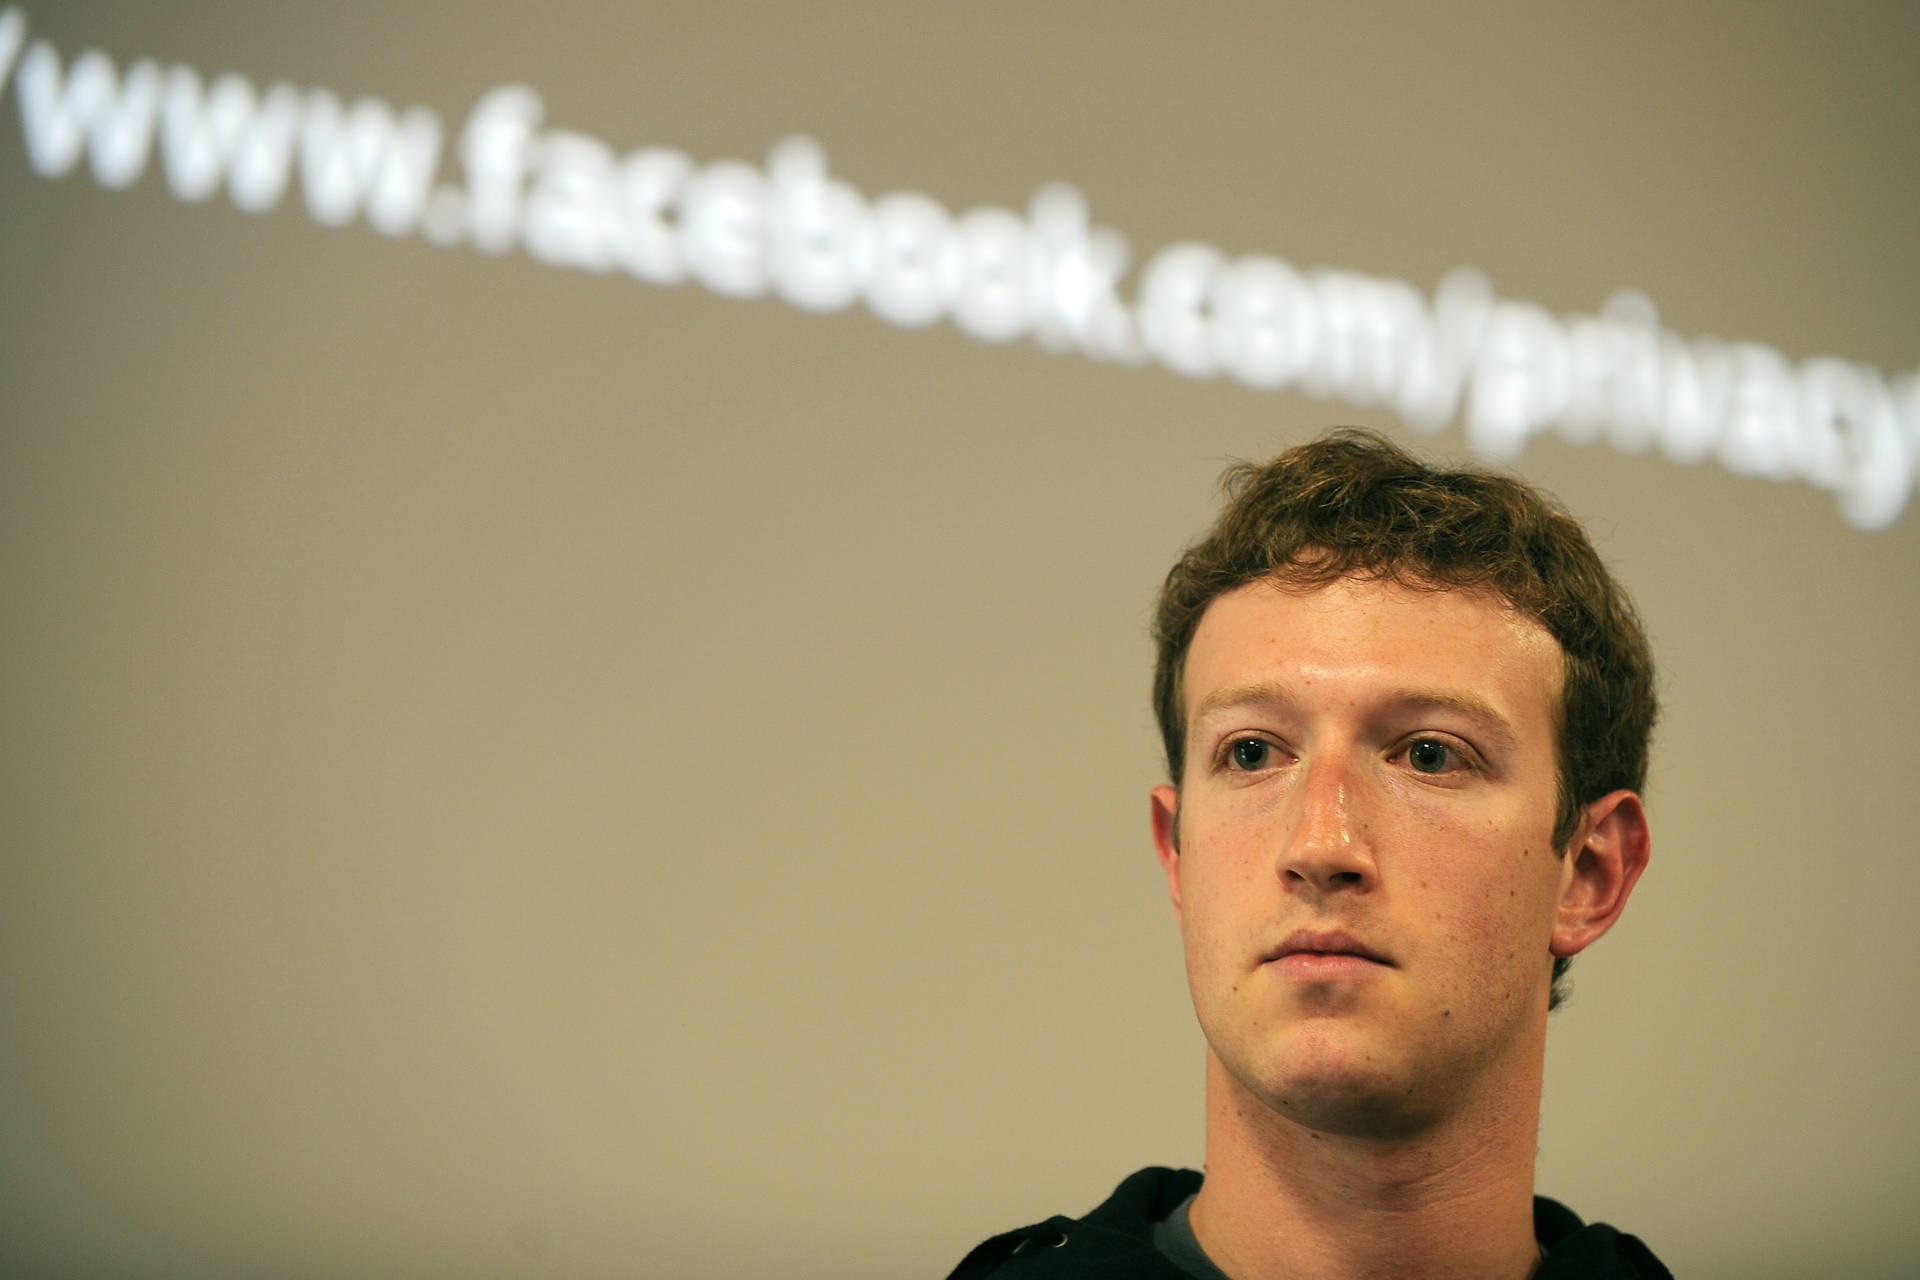 Facebook's Zuckerberg Pushes Globalization as Some U.S. Leaders Turn Inward